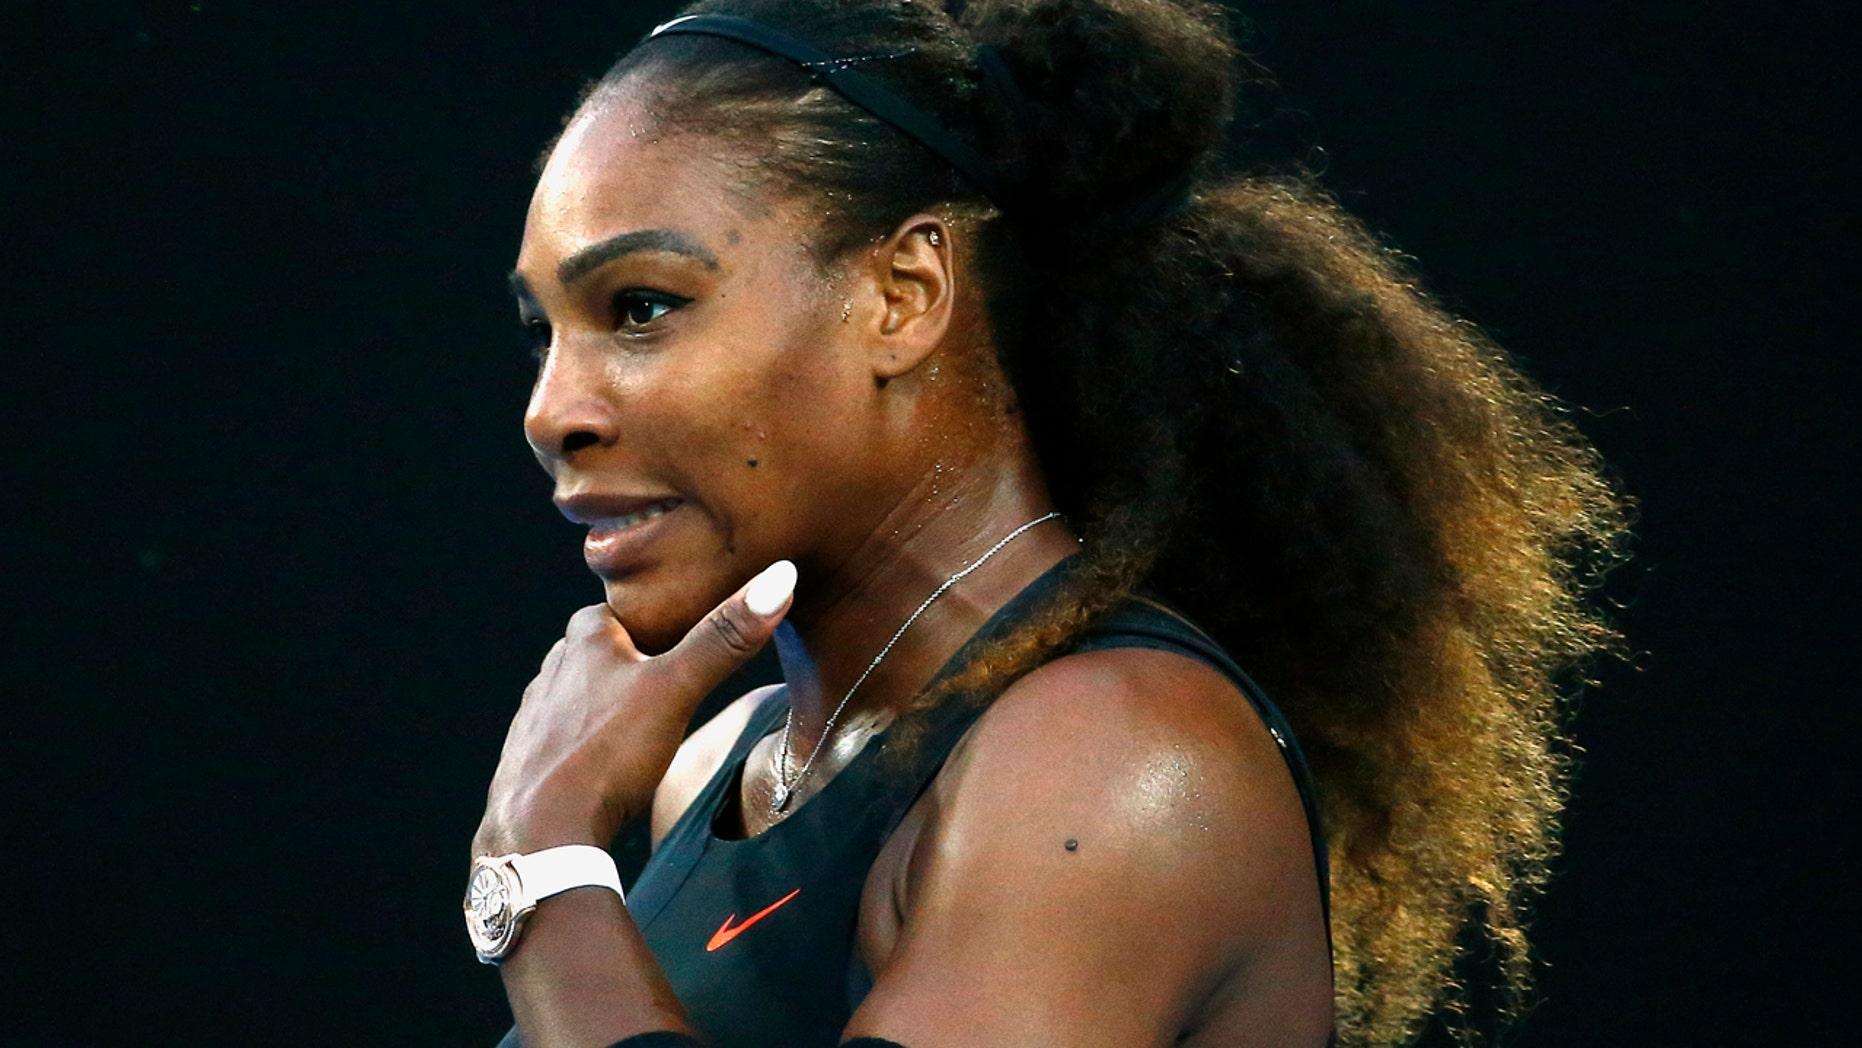 Tennis - Australian Open - Melbourne Park, Melbourne, Australia - 28/1/17 Serena Williams of the U.S. reacts during her Women's singles final match against Venus Williams of the U.S. .REUTERS/Edgar Su - RTSXQW6